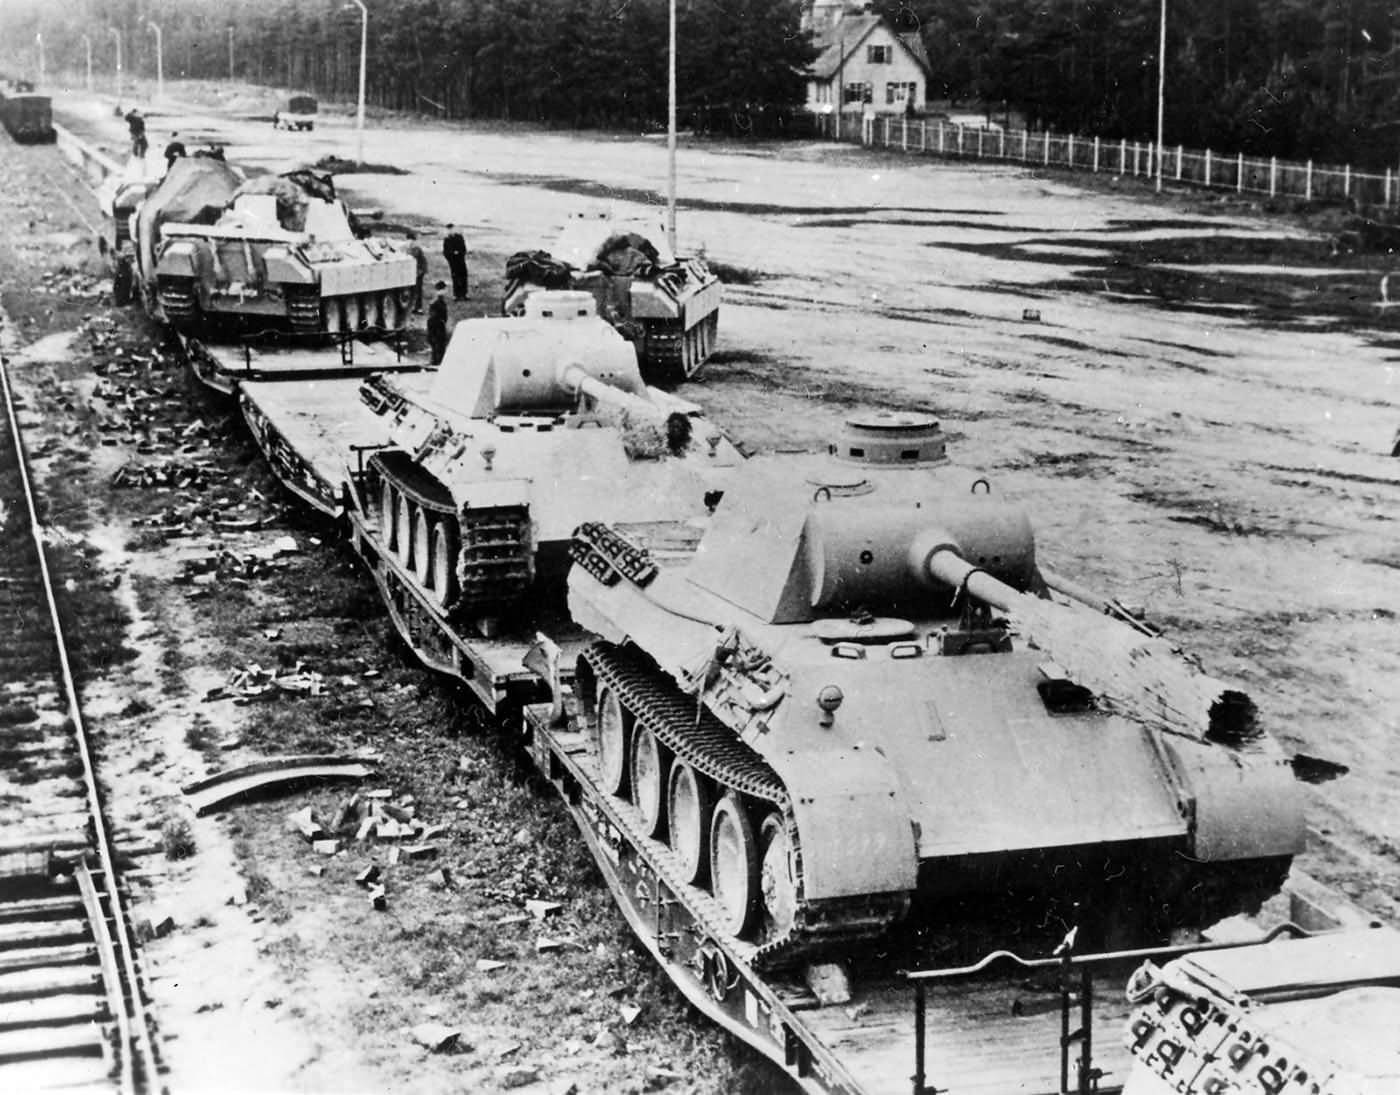 German Panzer V Panther Medium Tanks On Rail Cars 1944 World War Photos